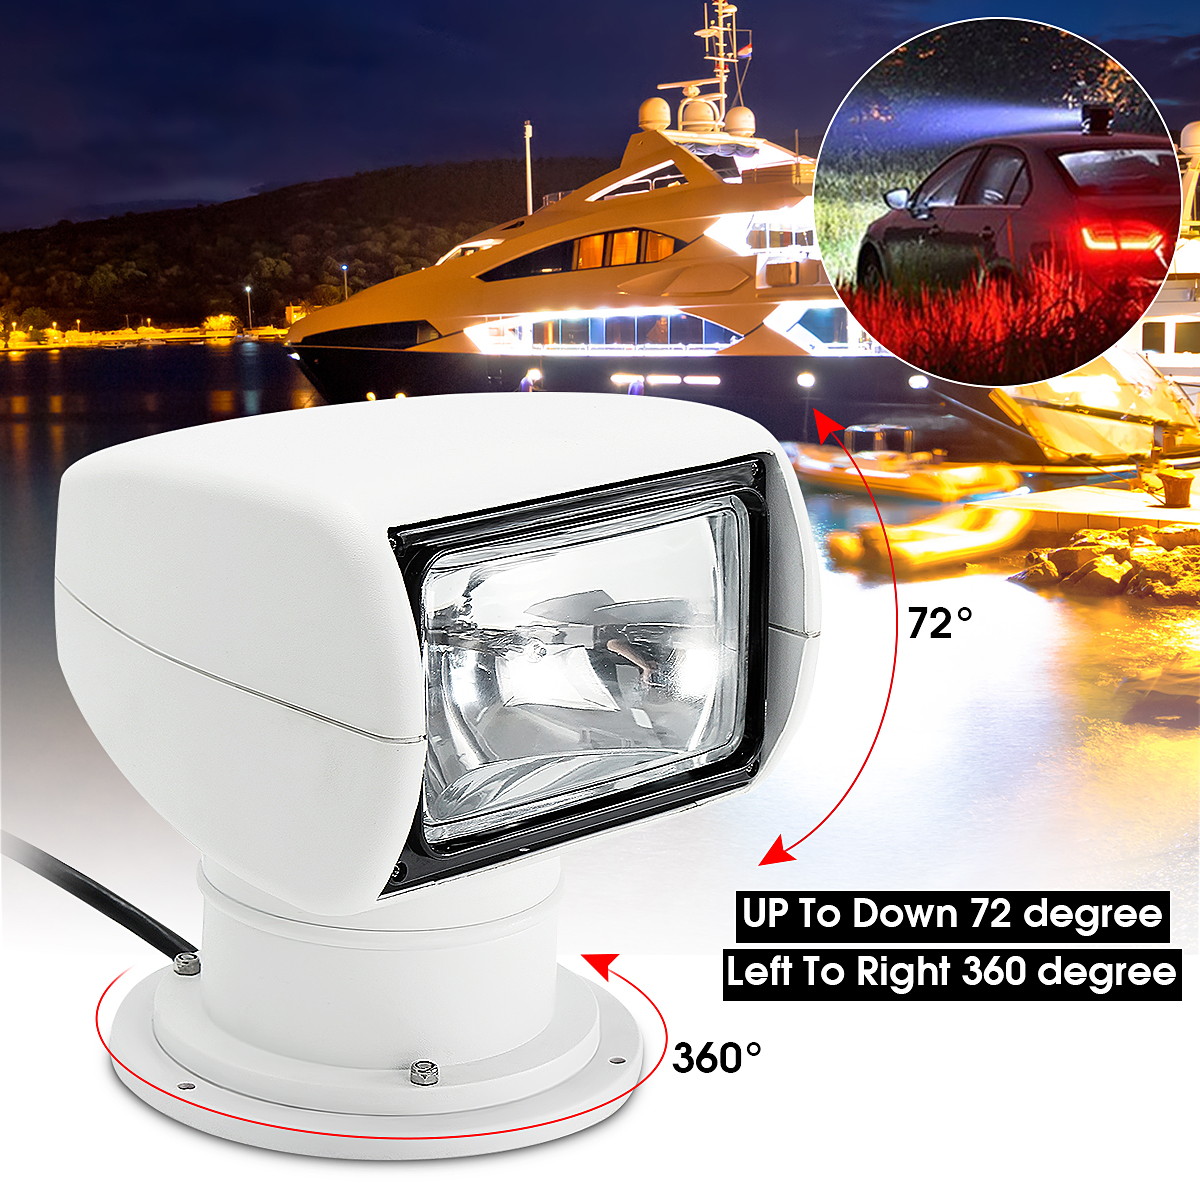 Smuxi Spotlight 12V 100W 2500LM 3200K Marine Searchlight Light Bulb PC+Aluminum Remote Control Multi angled White-in LED Spotlights from Lights & Lighting